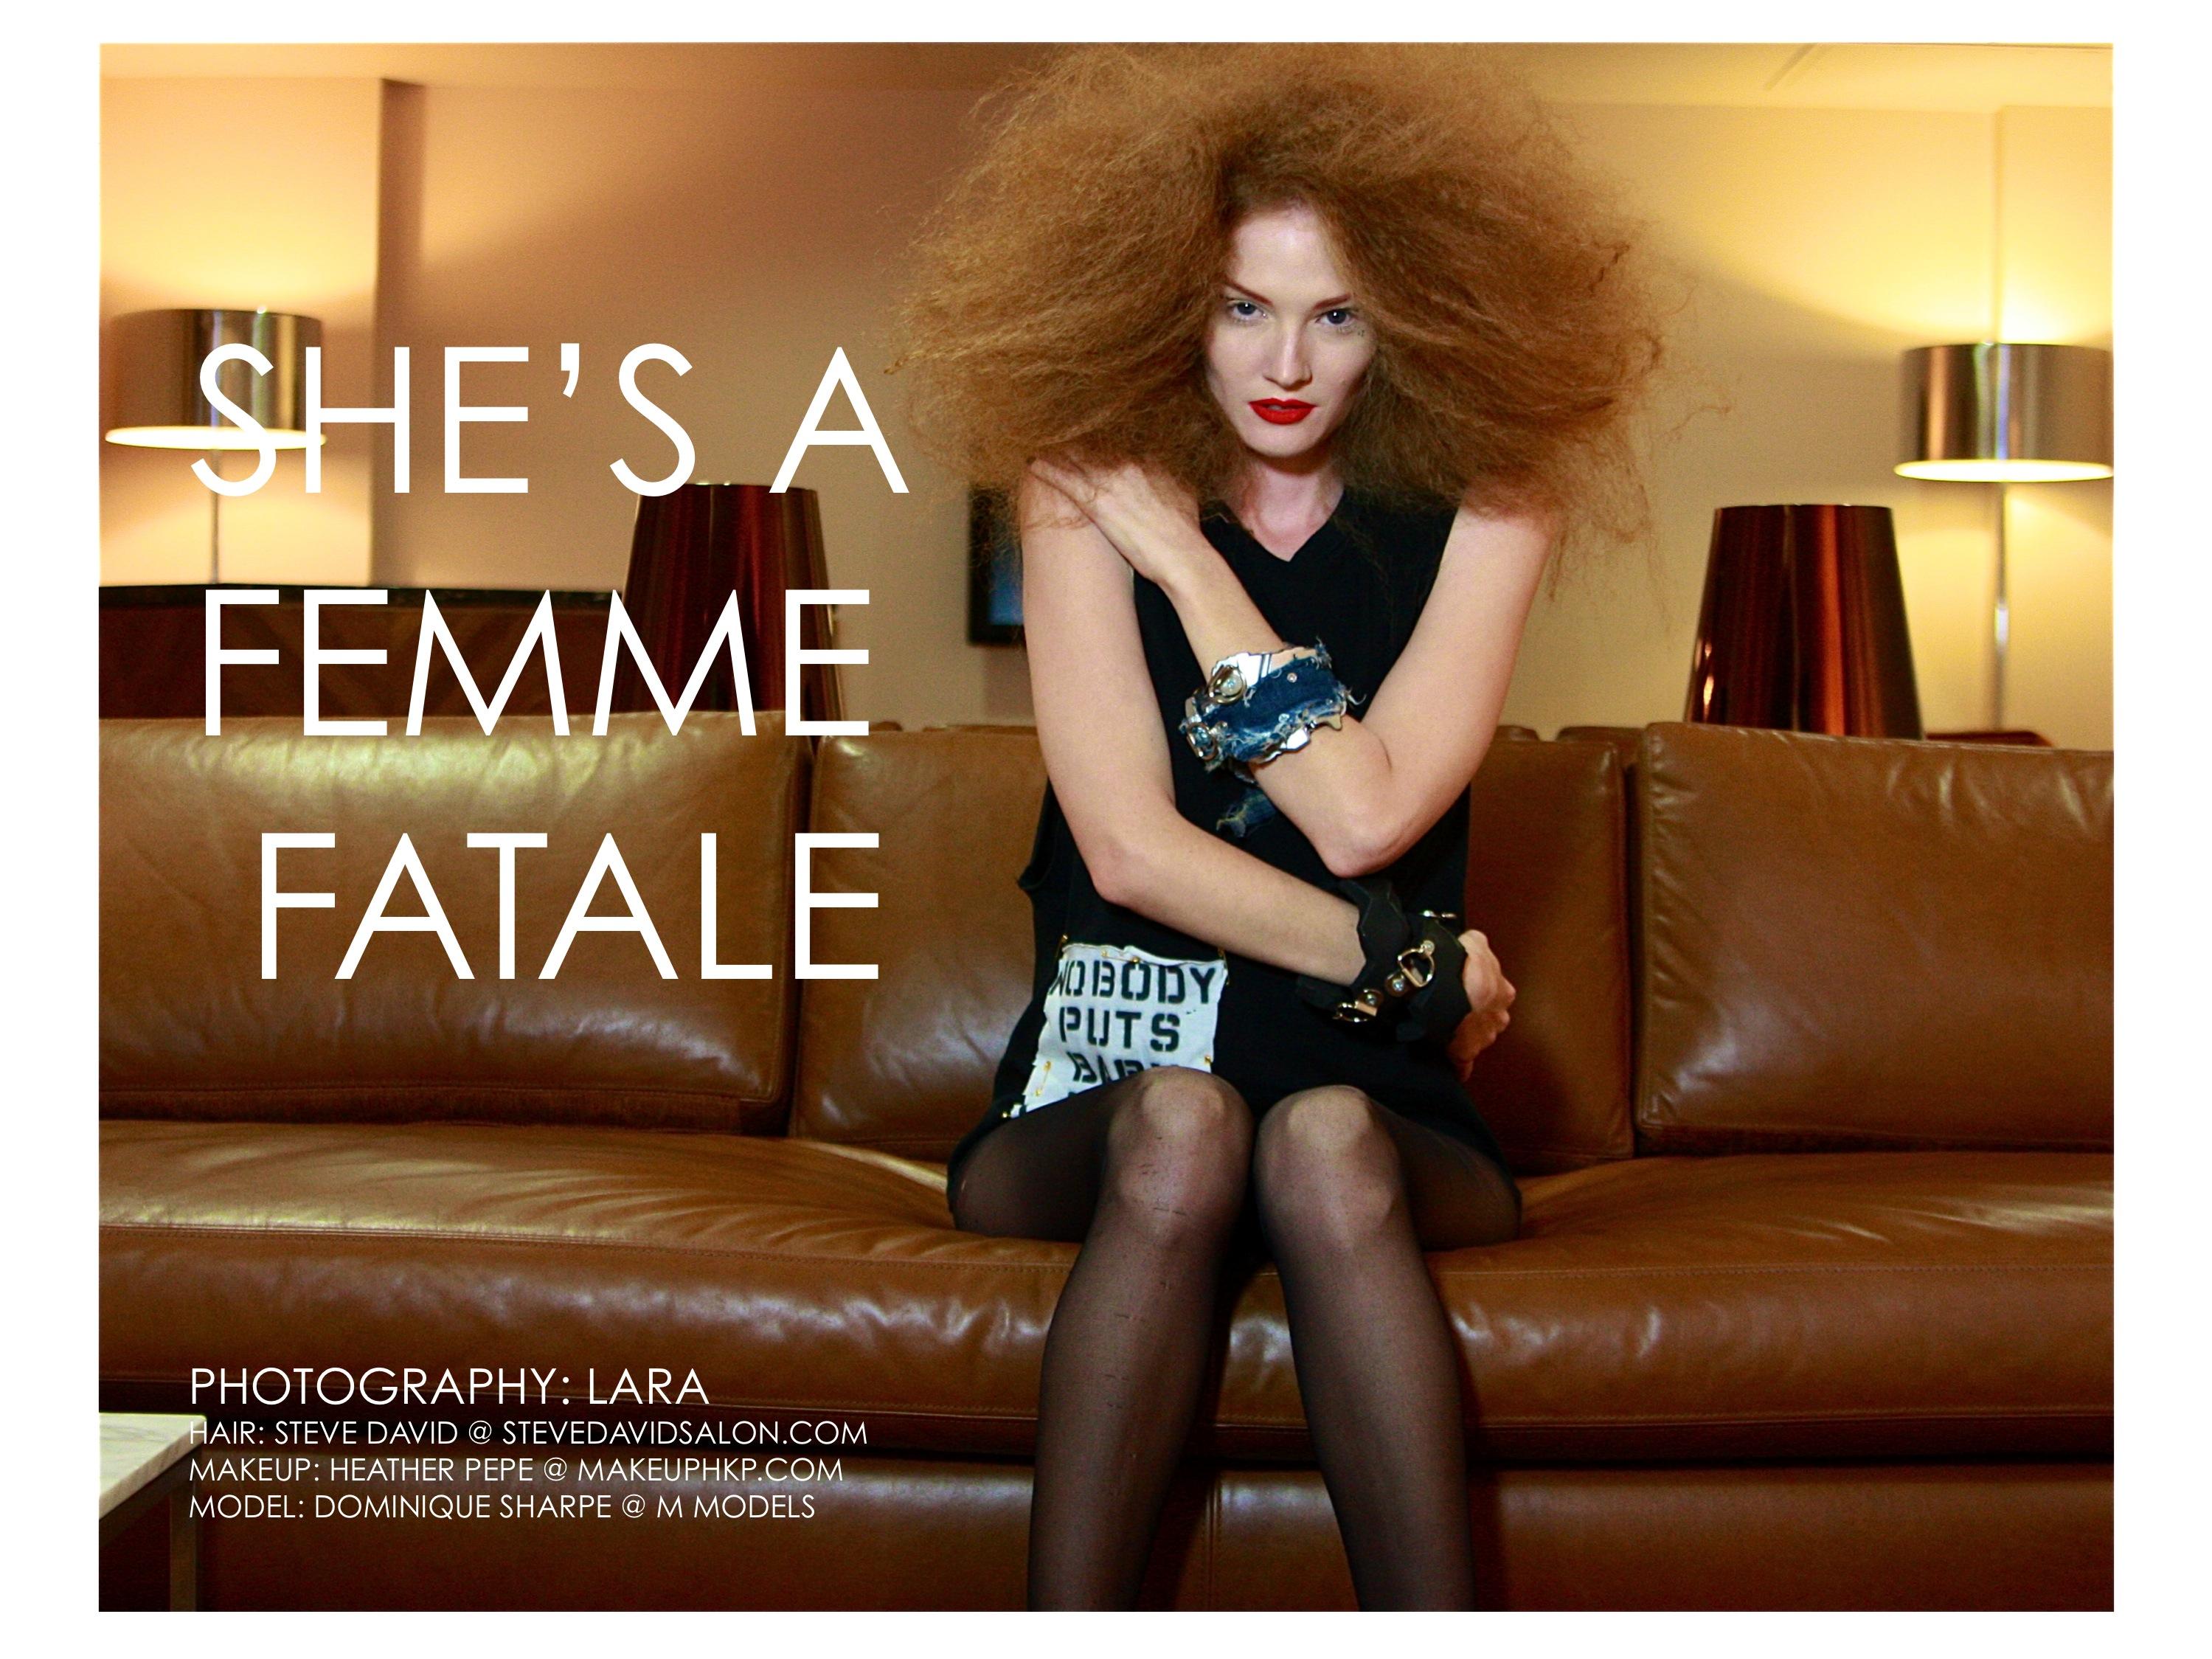 FEMME FATALE /ph- LARA